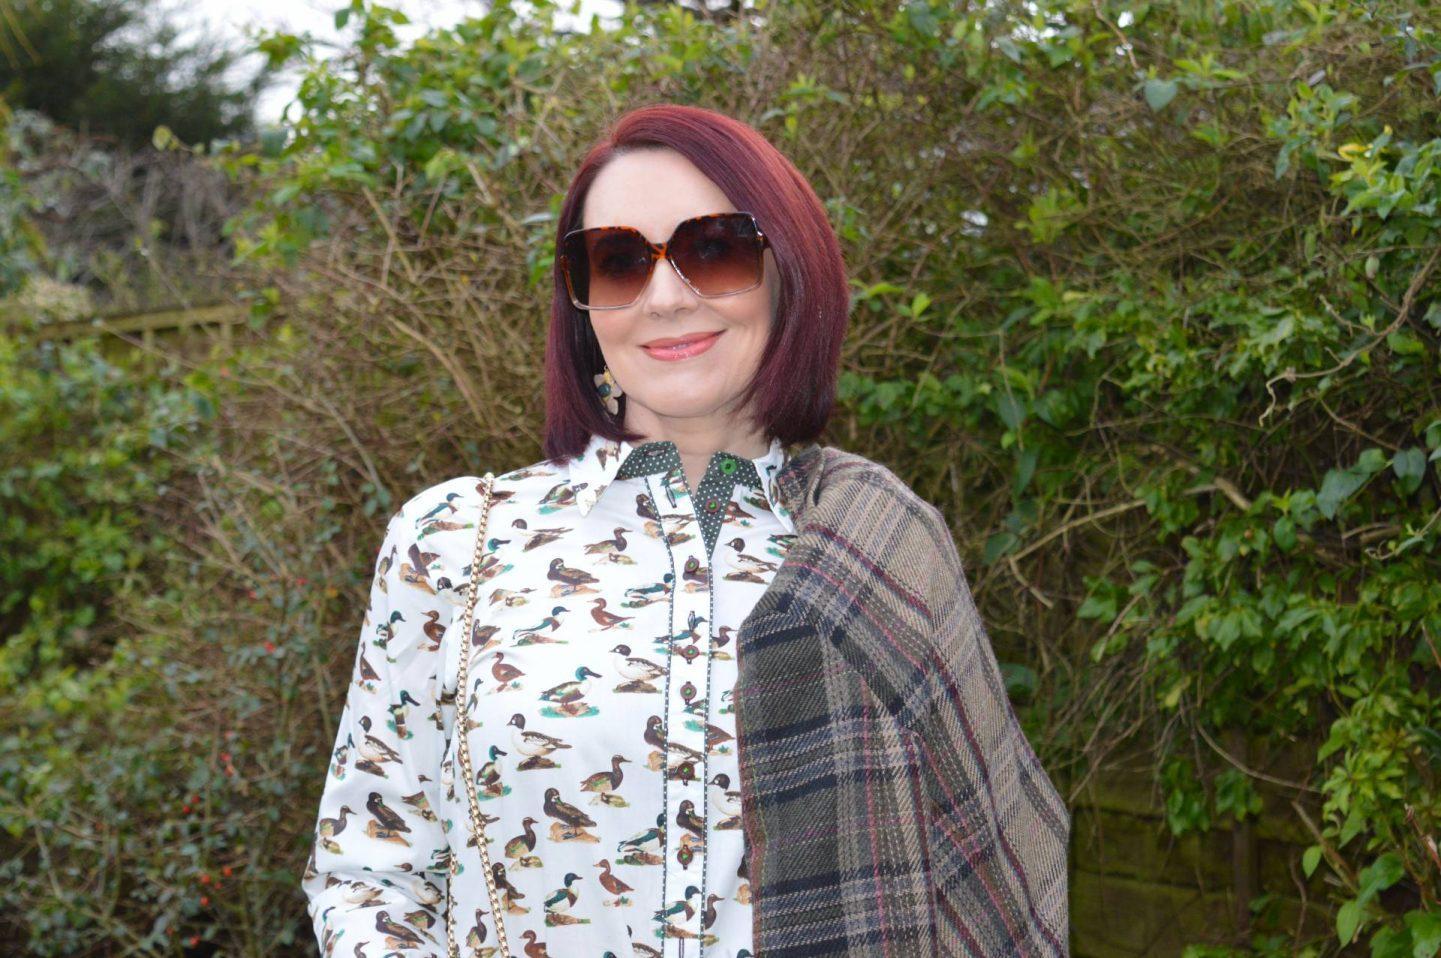 Salamander Shirts Duck Print Shirt, SVNX brown square sunglasses